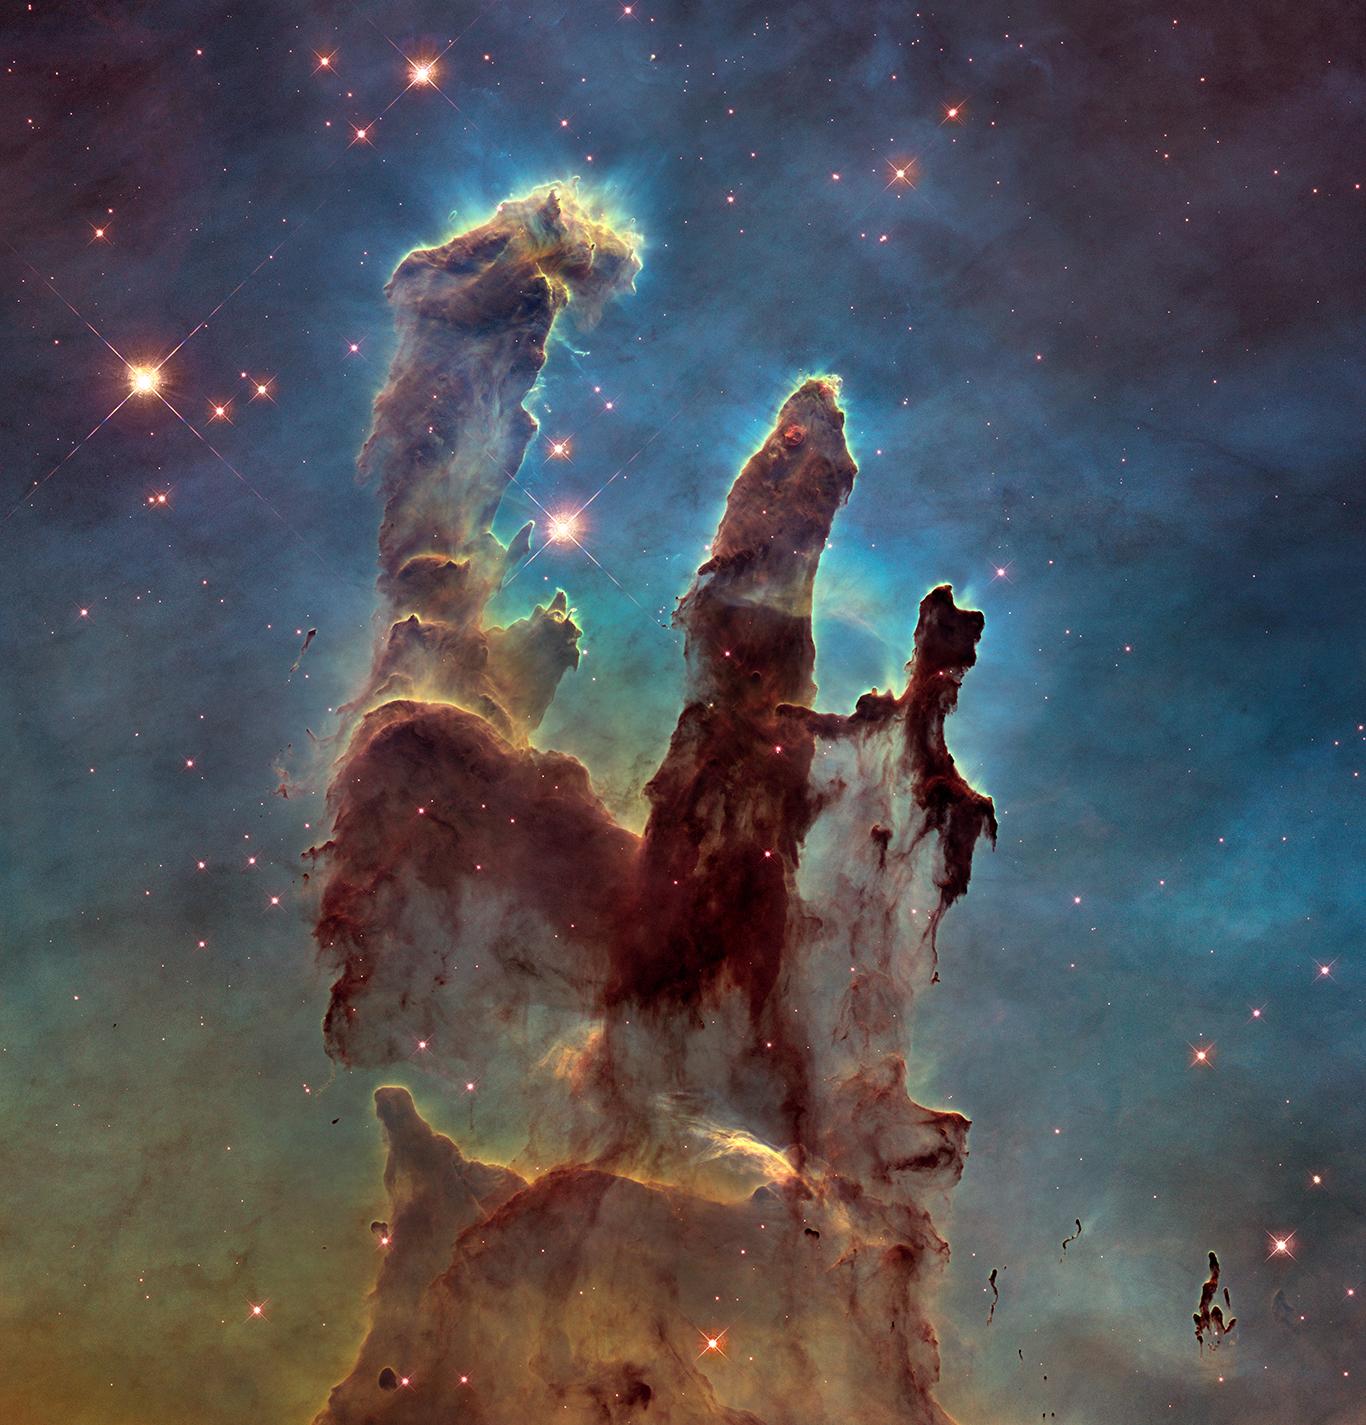 A stellar nursery known as the Pillars of Creation